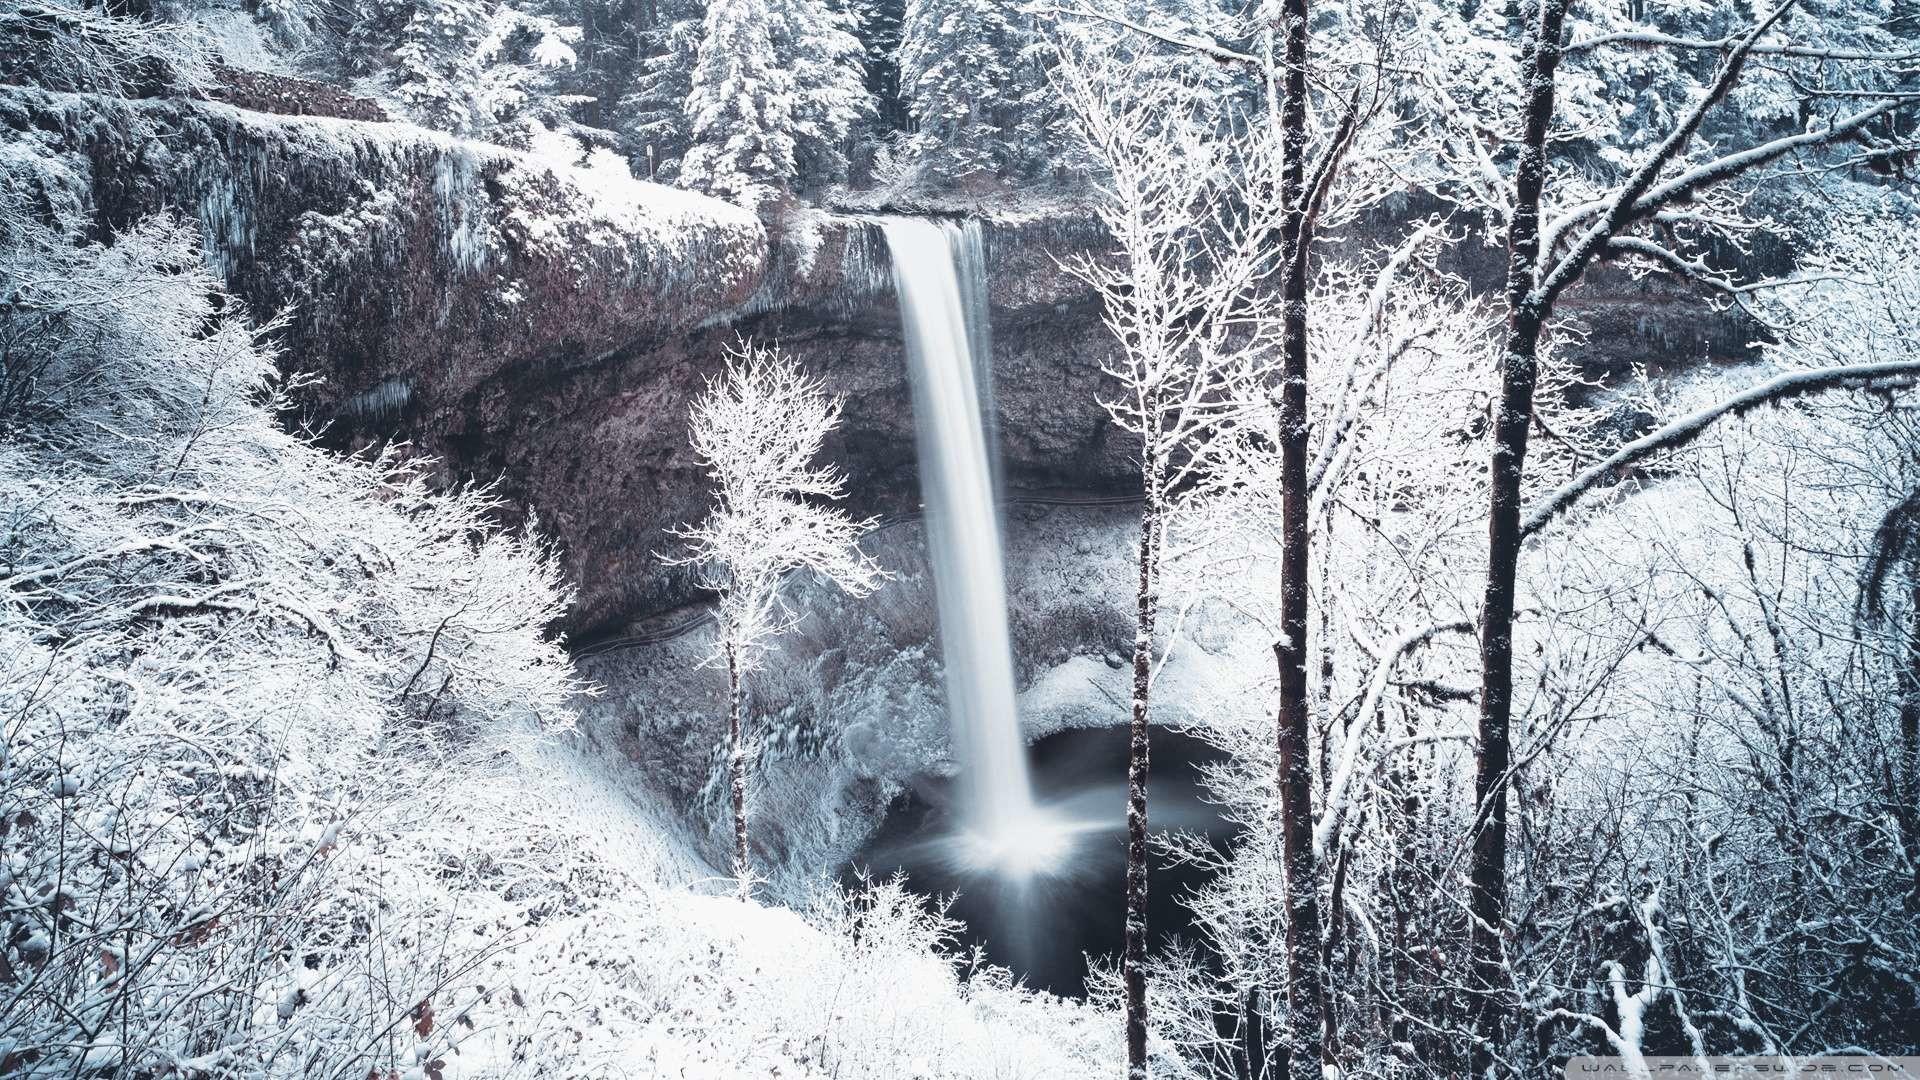 Explore Winter Wallpaper, Free Books, and more!